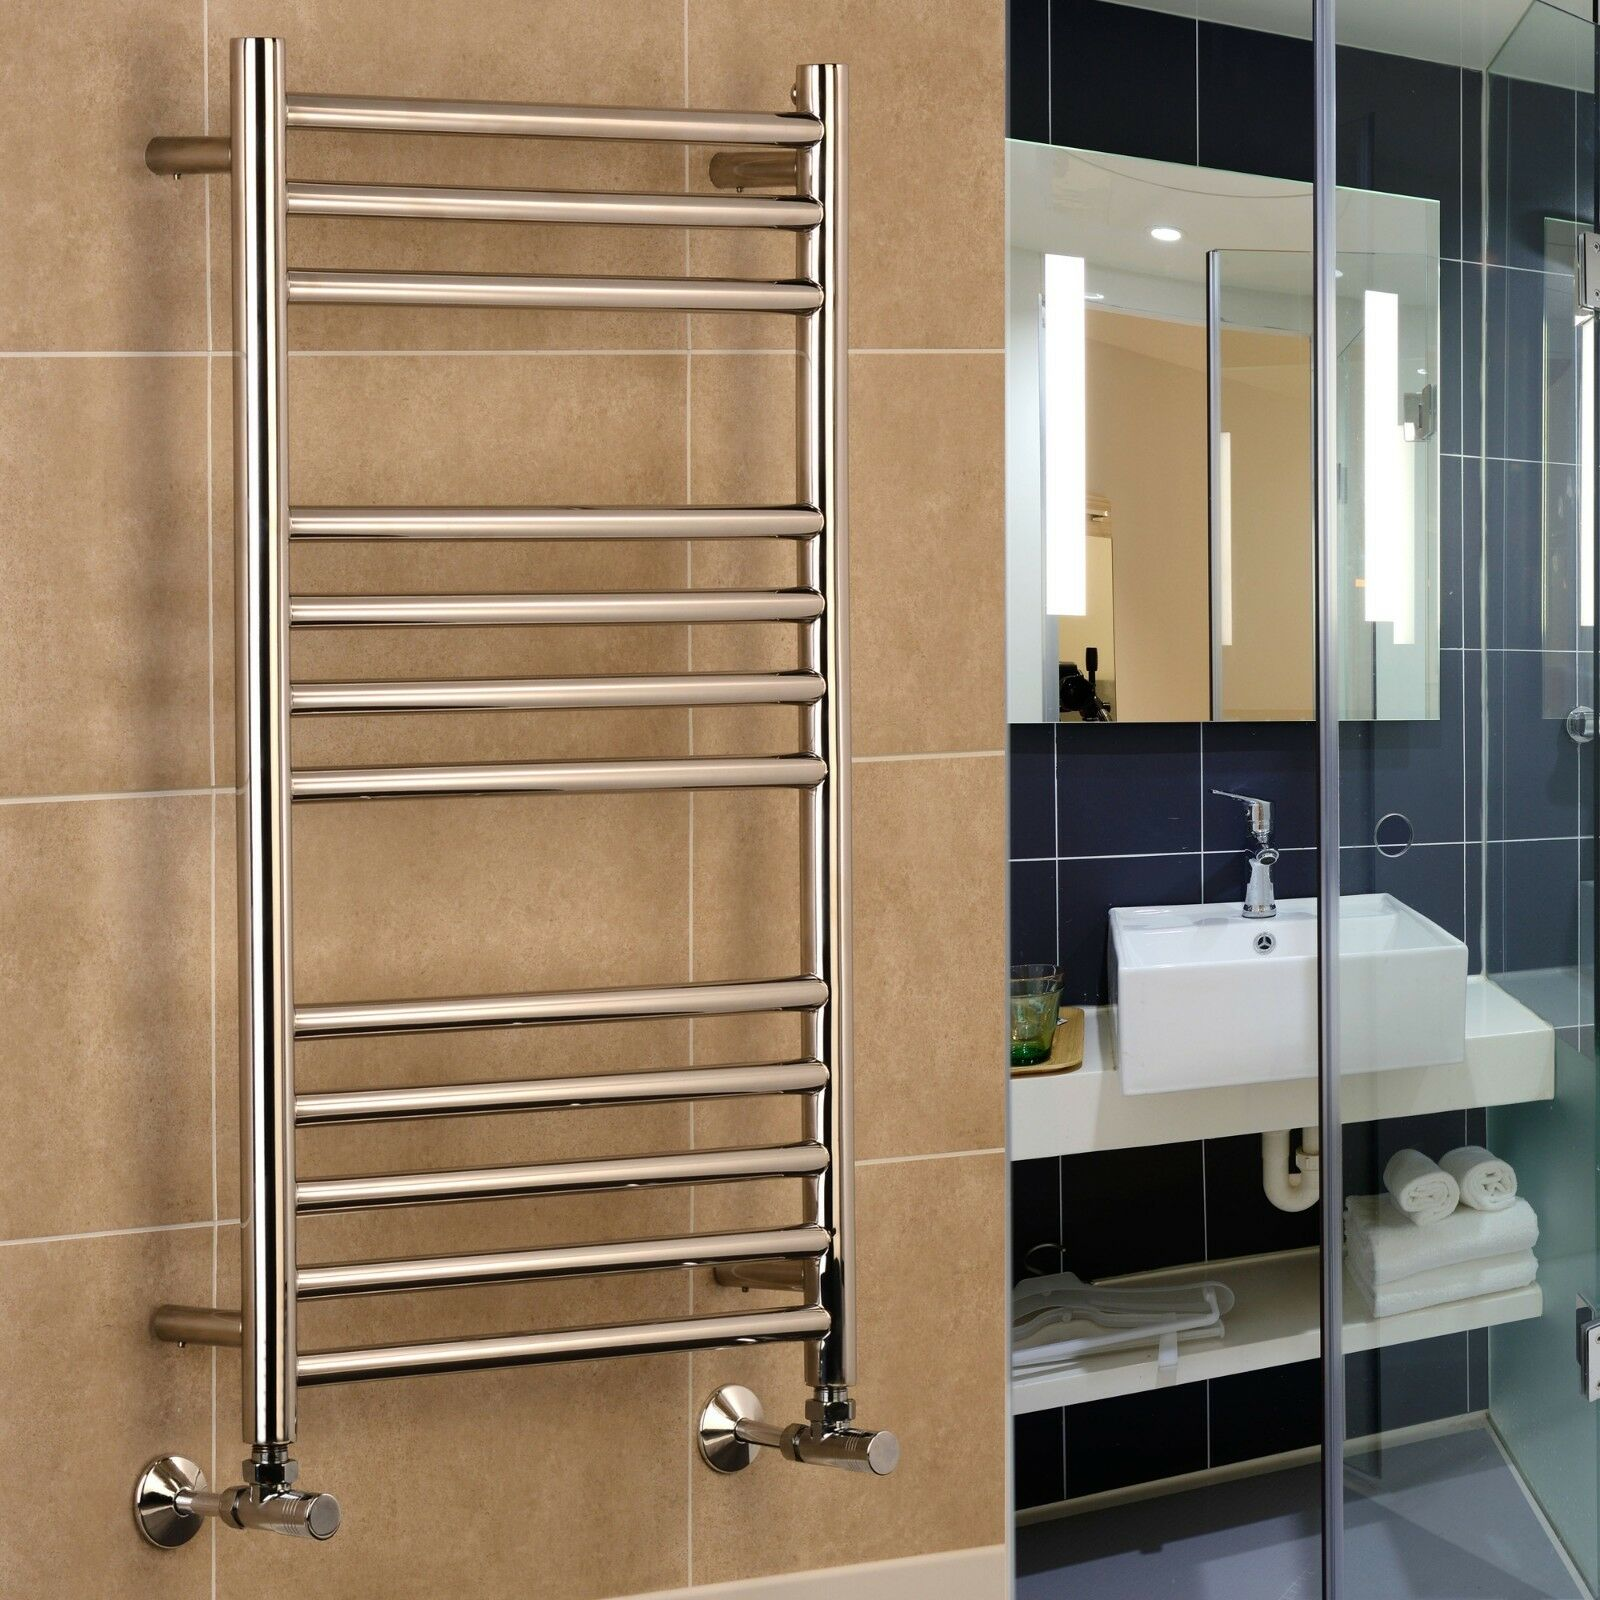 RIGA en Acier Inoxydable Chauffage Central Porte-serviettes salle de bains radiateur 400 500 600 W